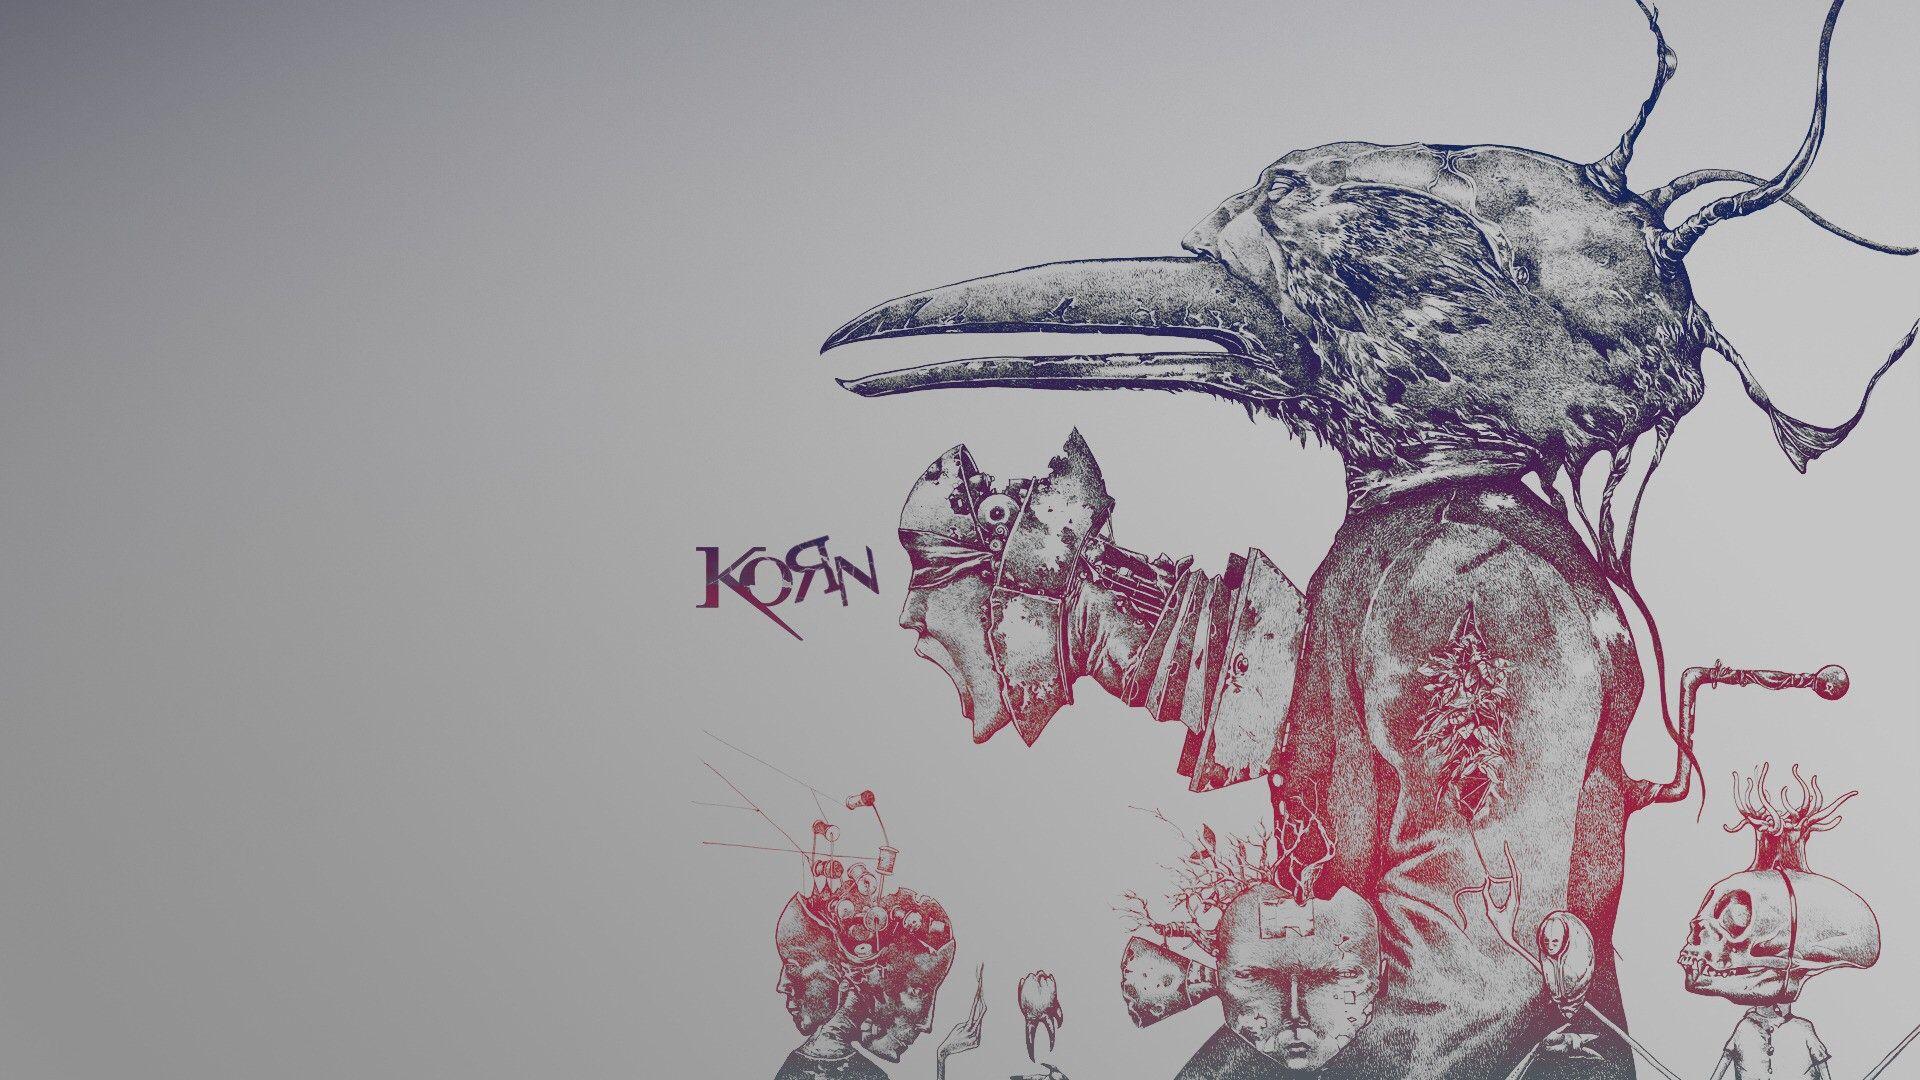 Pin By Wayne Branam On Rock N Roll Music Wallpaper Korn Hd Wallpaper